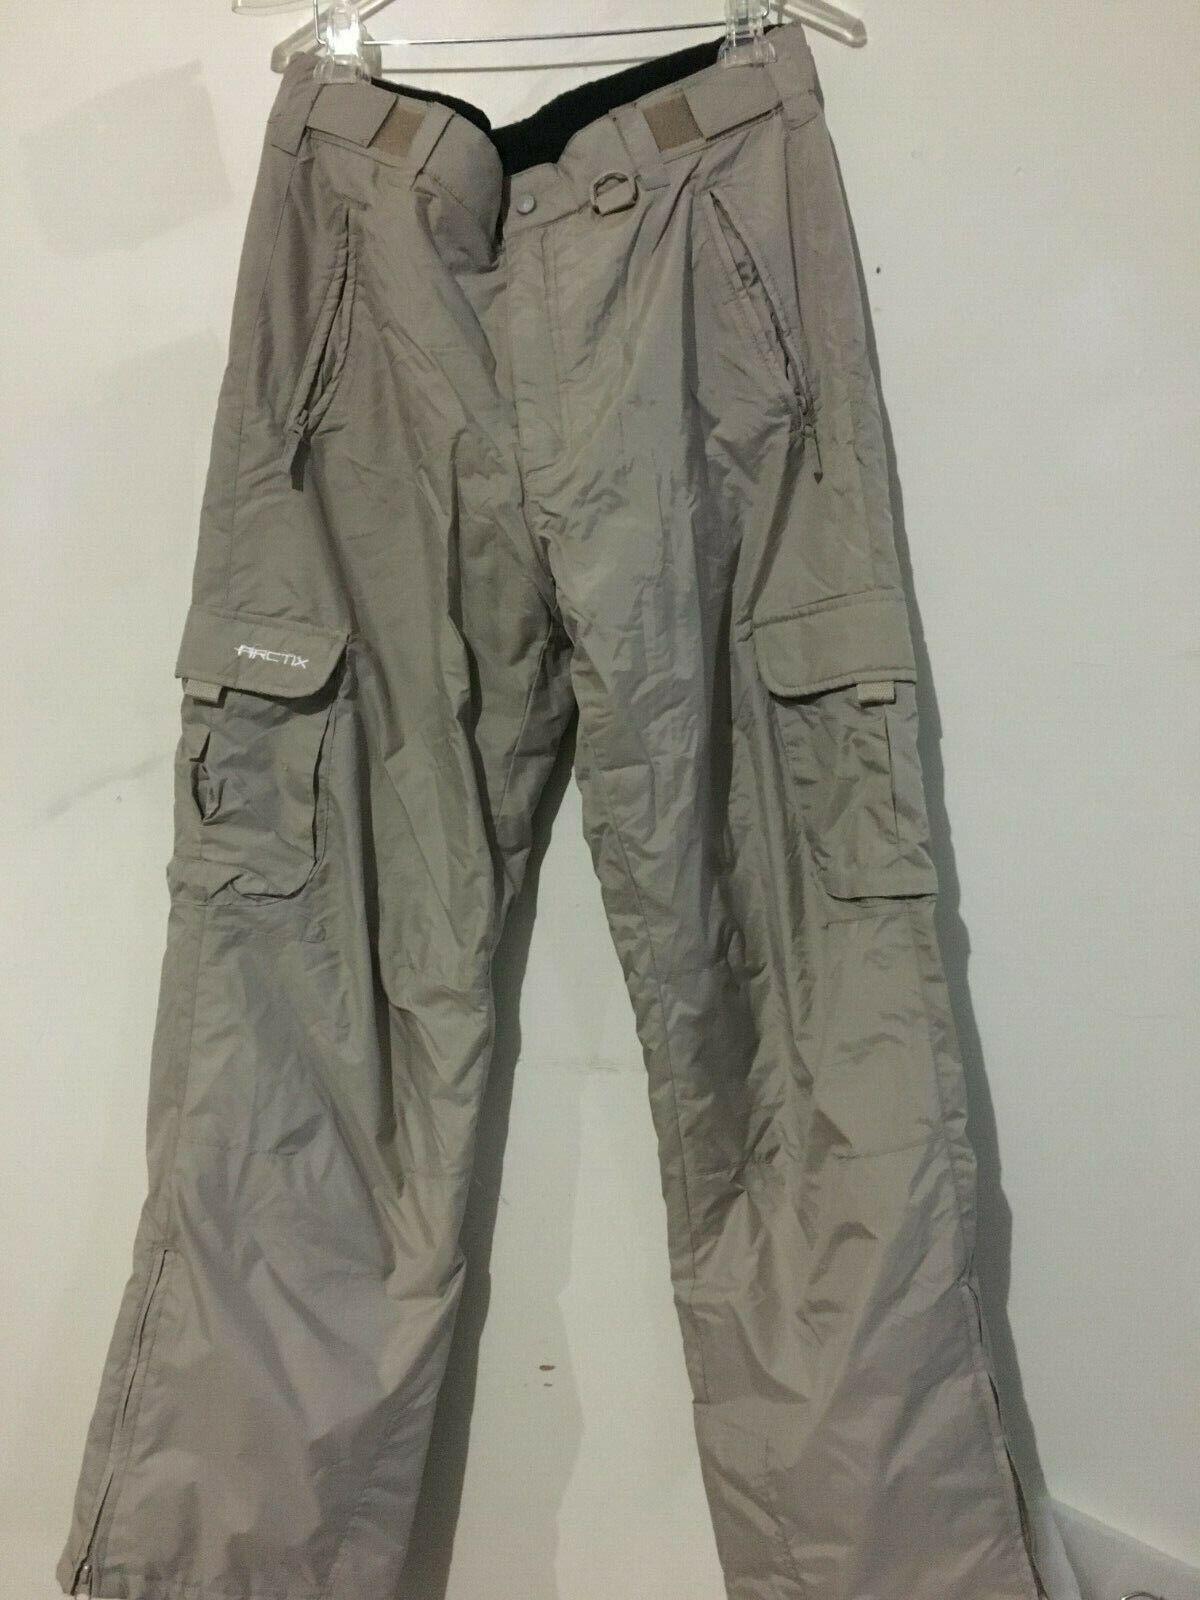 Arctix Men Tan Snow Ski Pant Double Layer Zip Ankle  Size L StyleBur1960  big sale